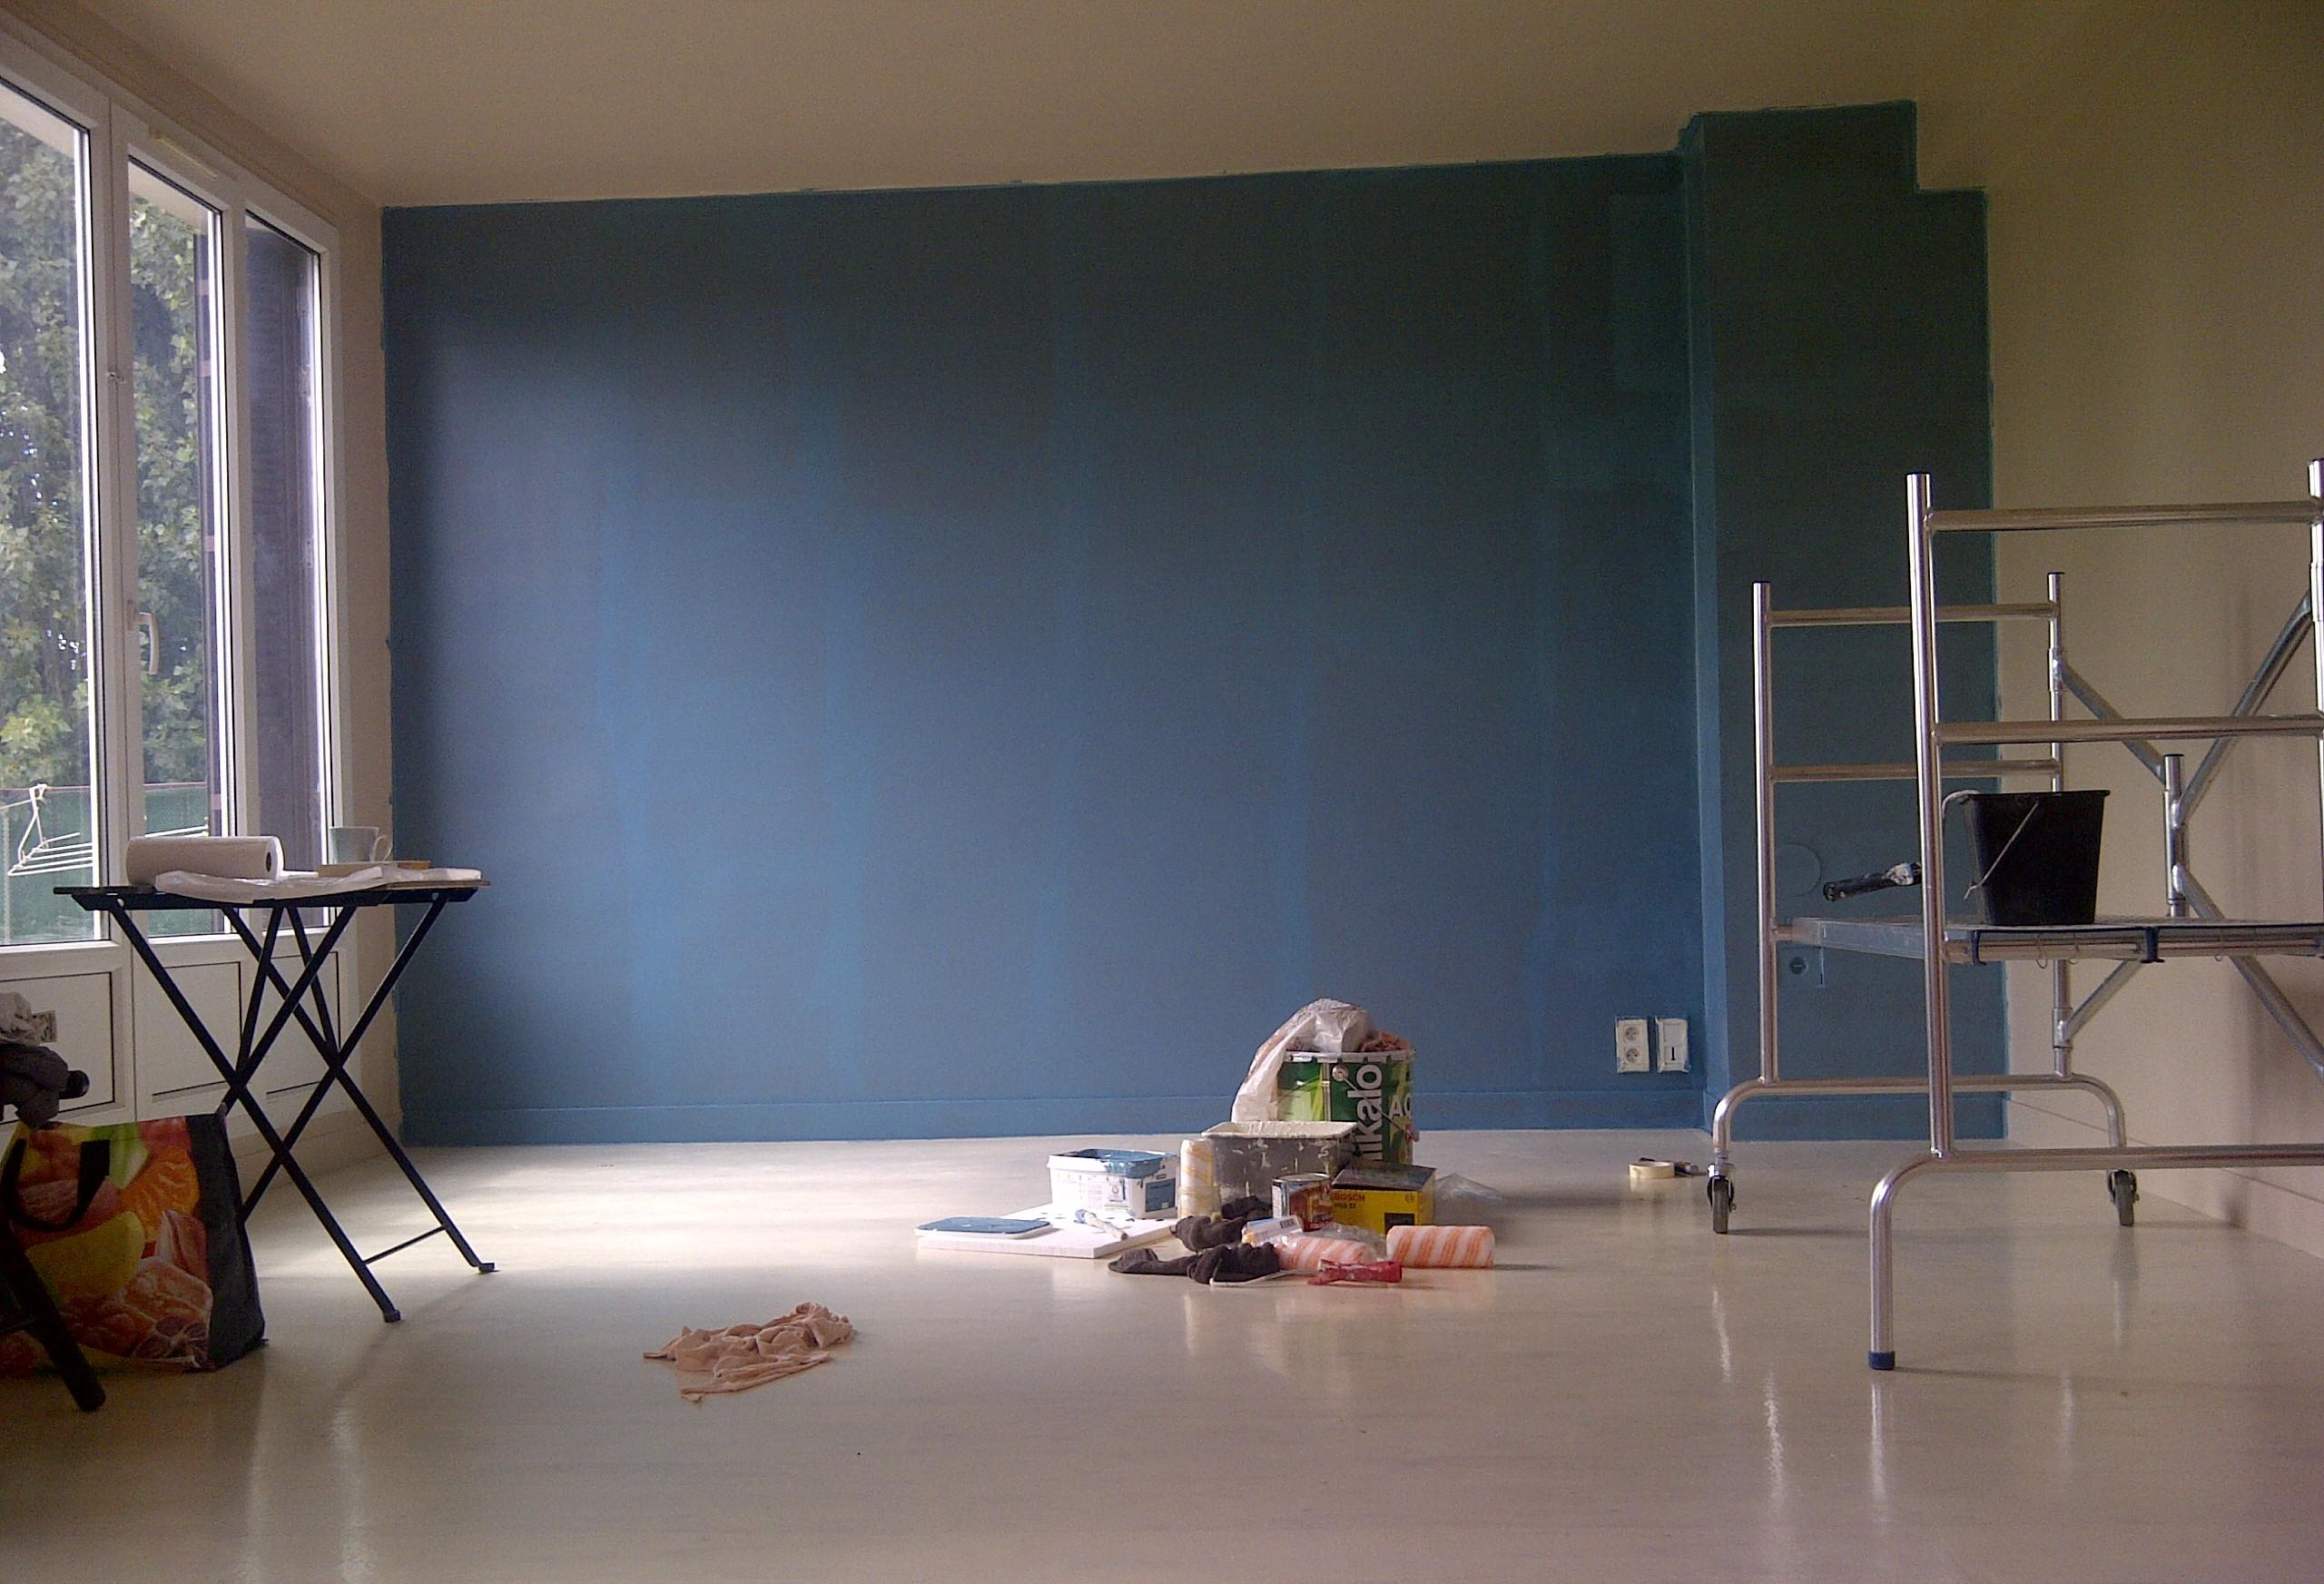 Cuisine peinte en bleu for Peinture bleu salon